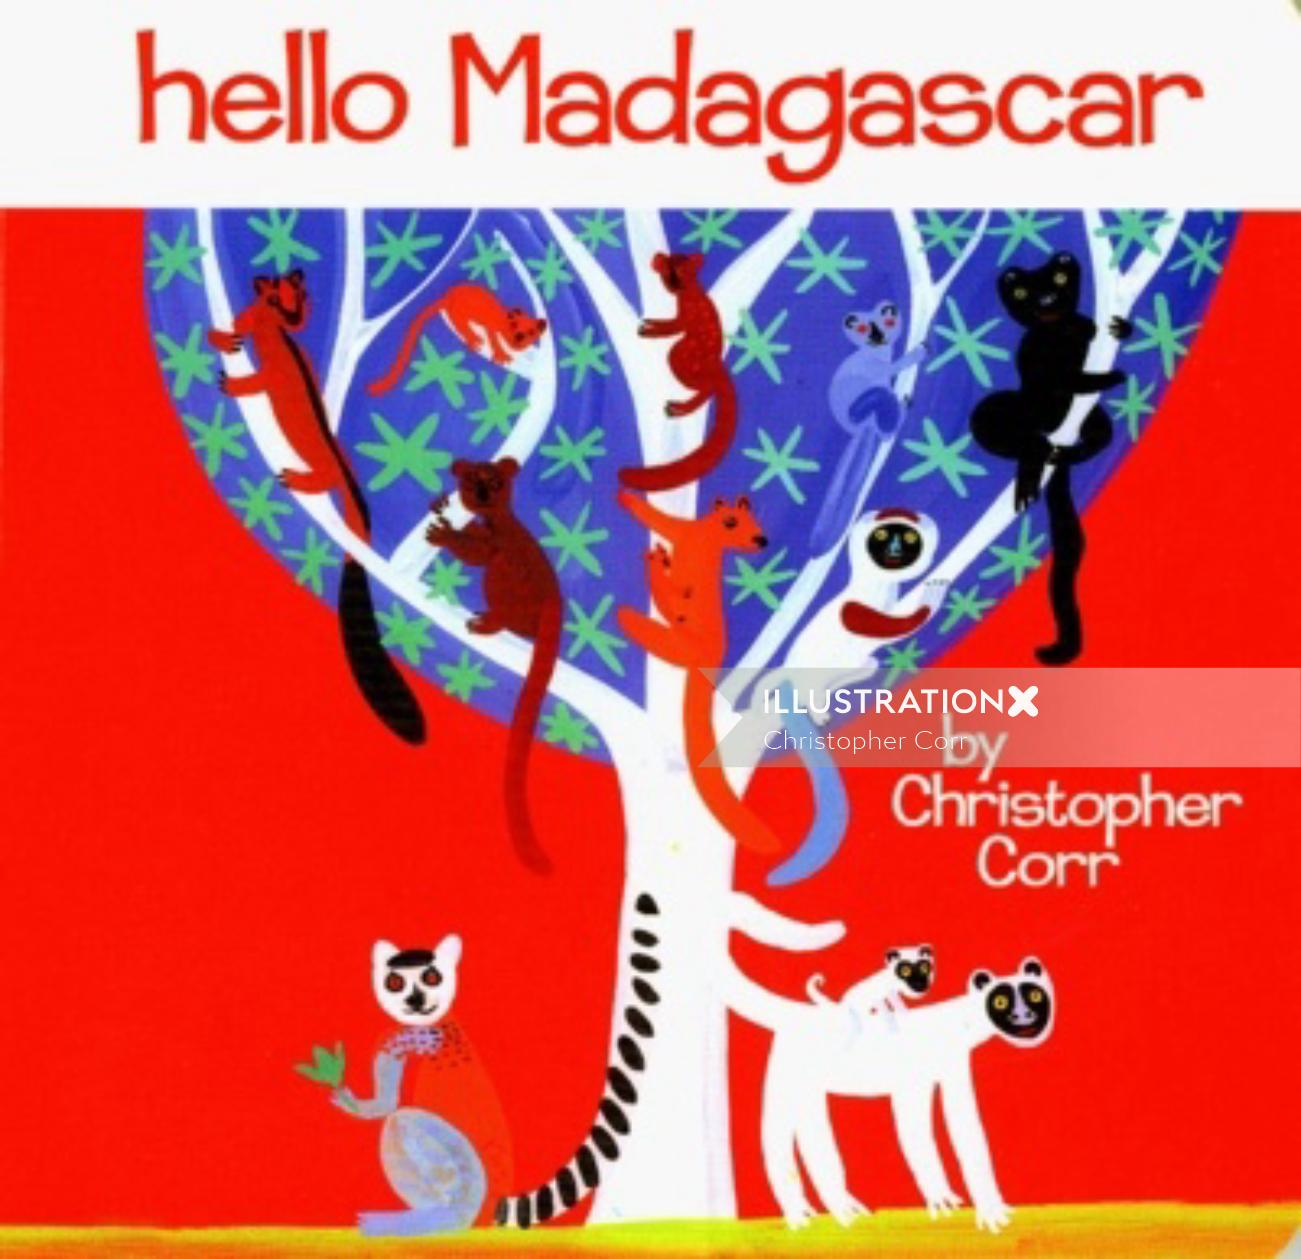 Madagascar animal illustration